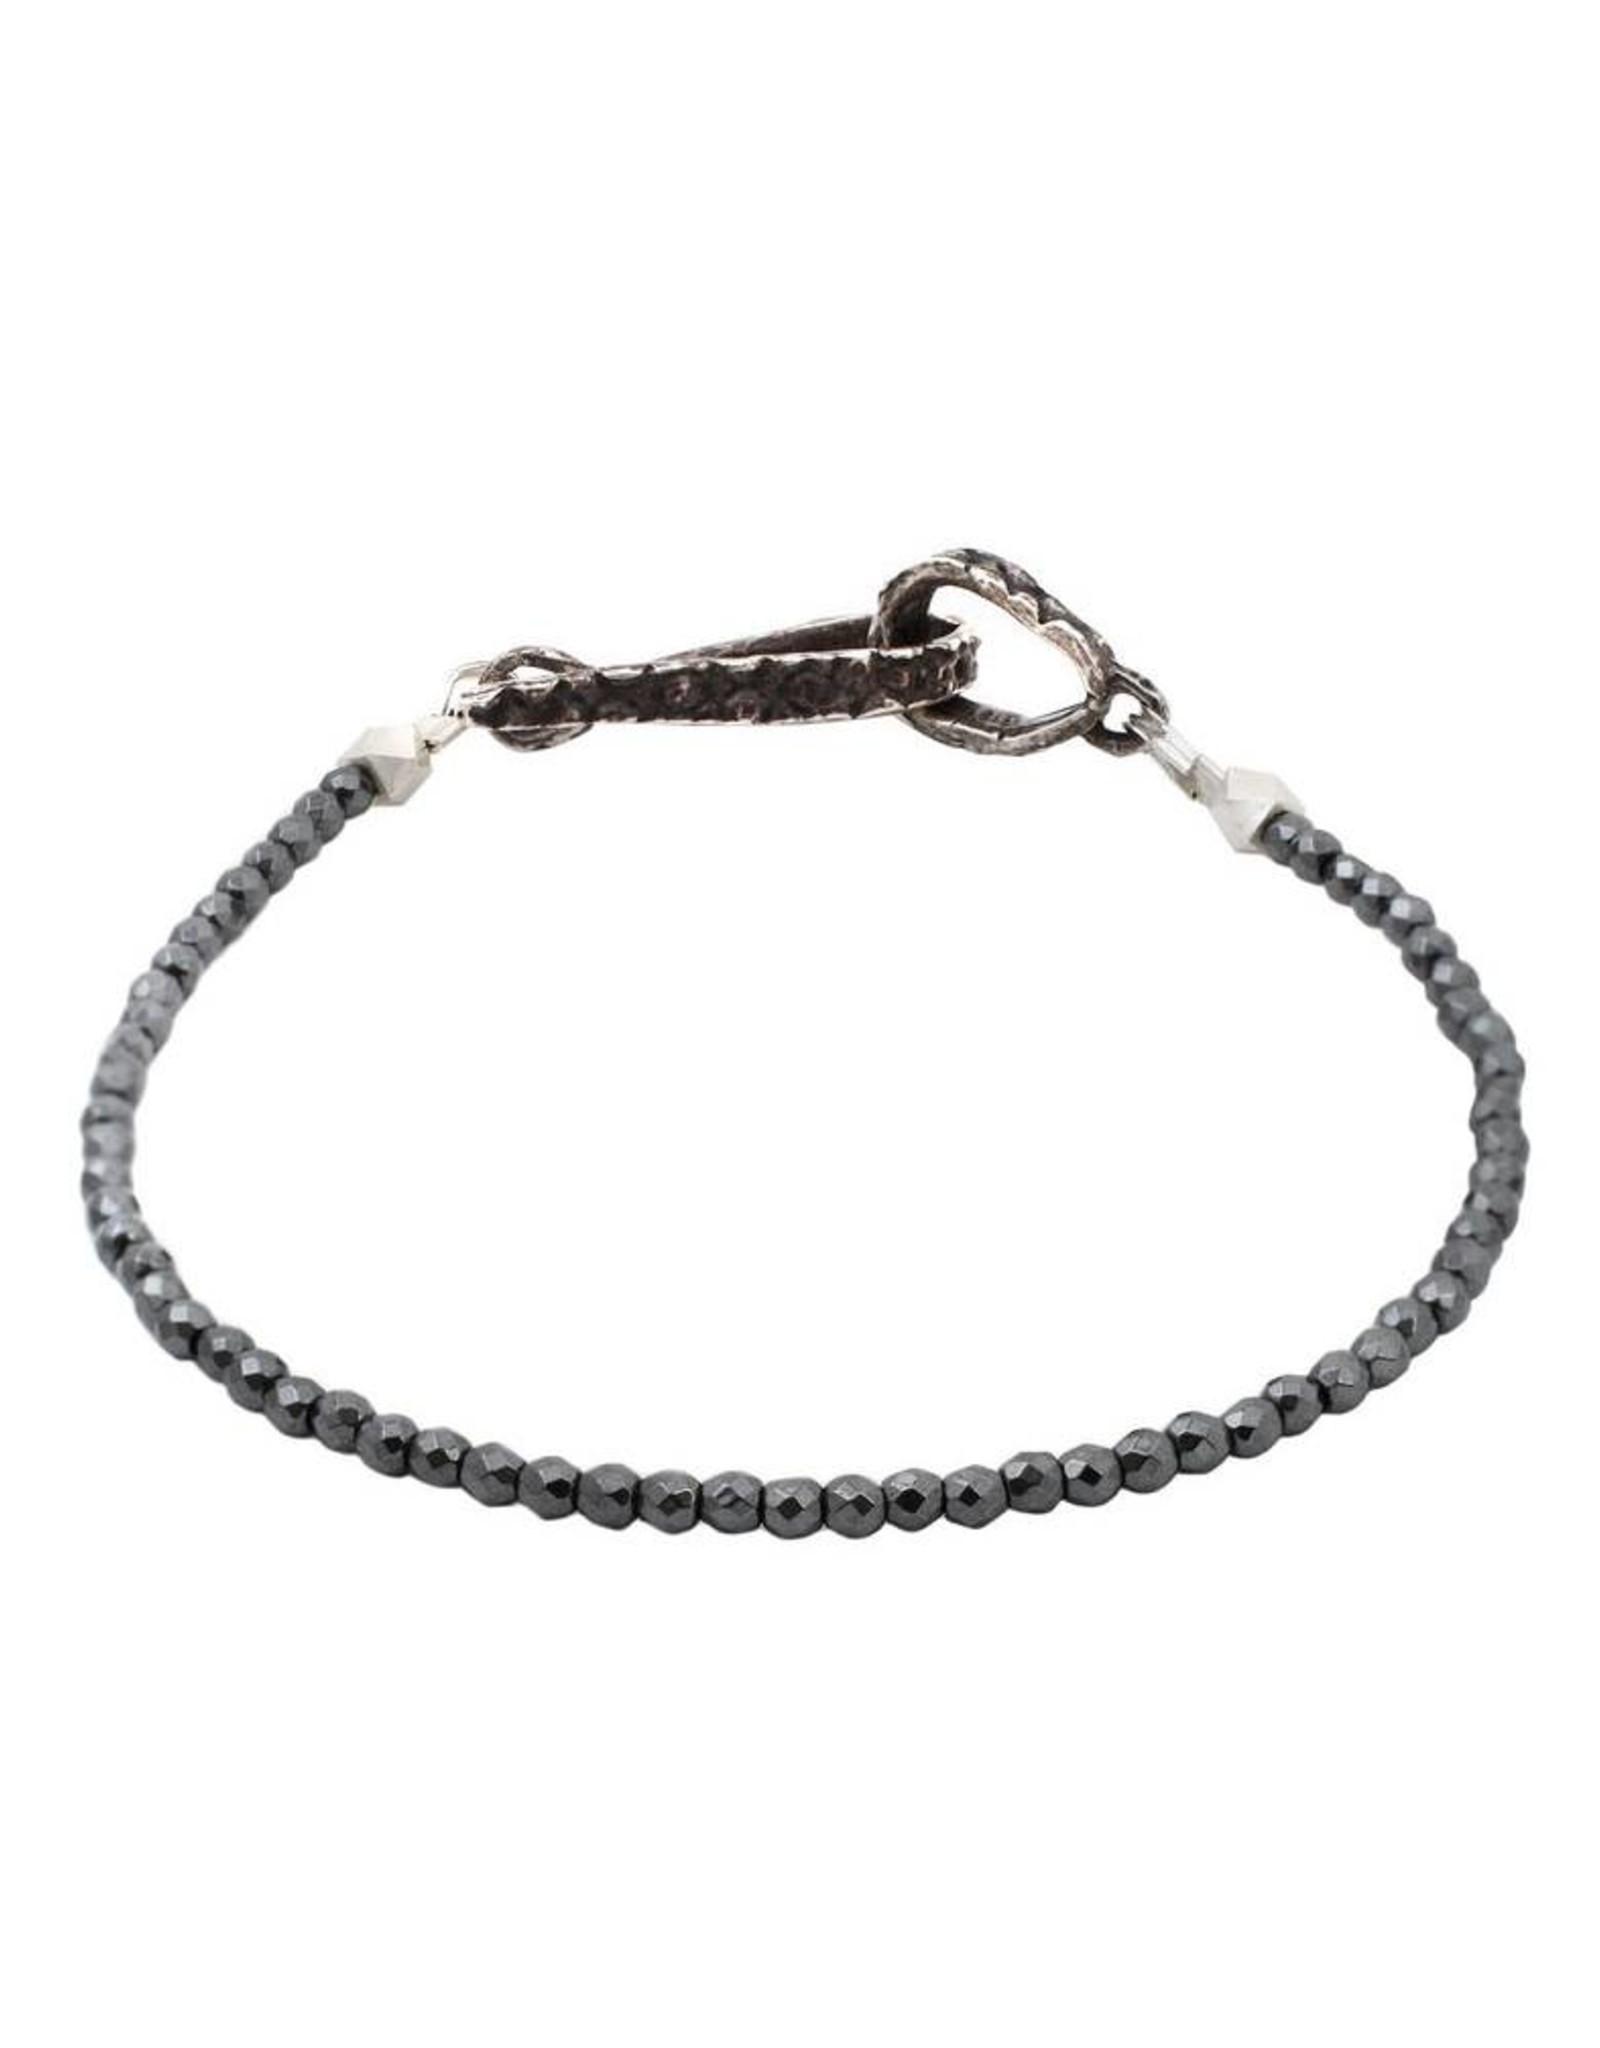 Lauren Wolf Jewelry Strand Bracelet - Hematite